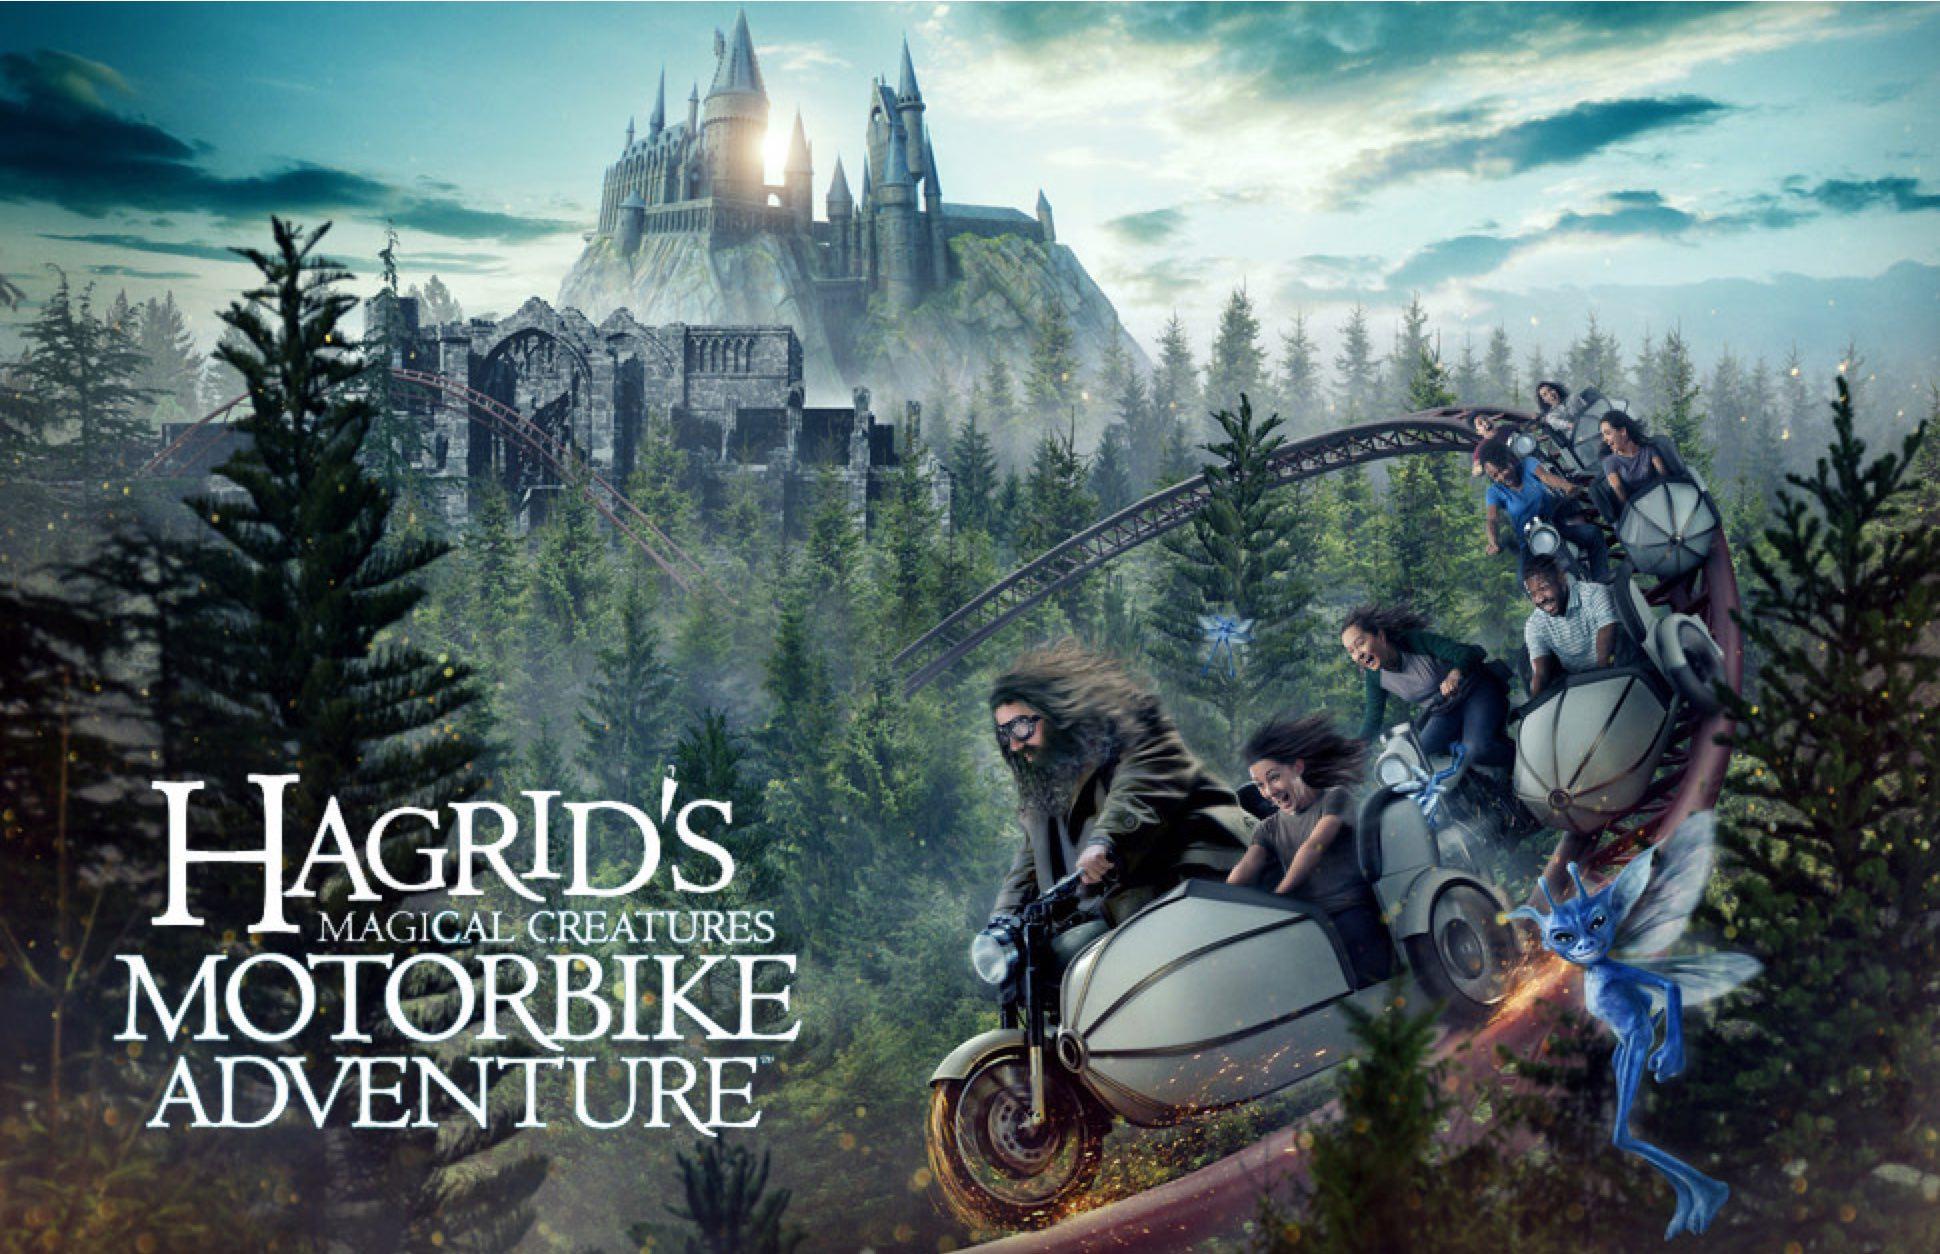 Hagrid's Magical Creatures Motorbike Adventure Review – /Film